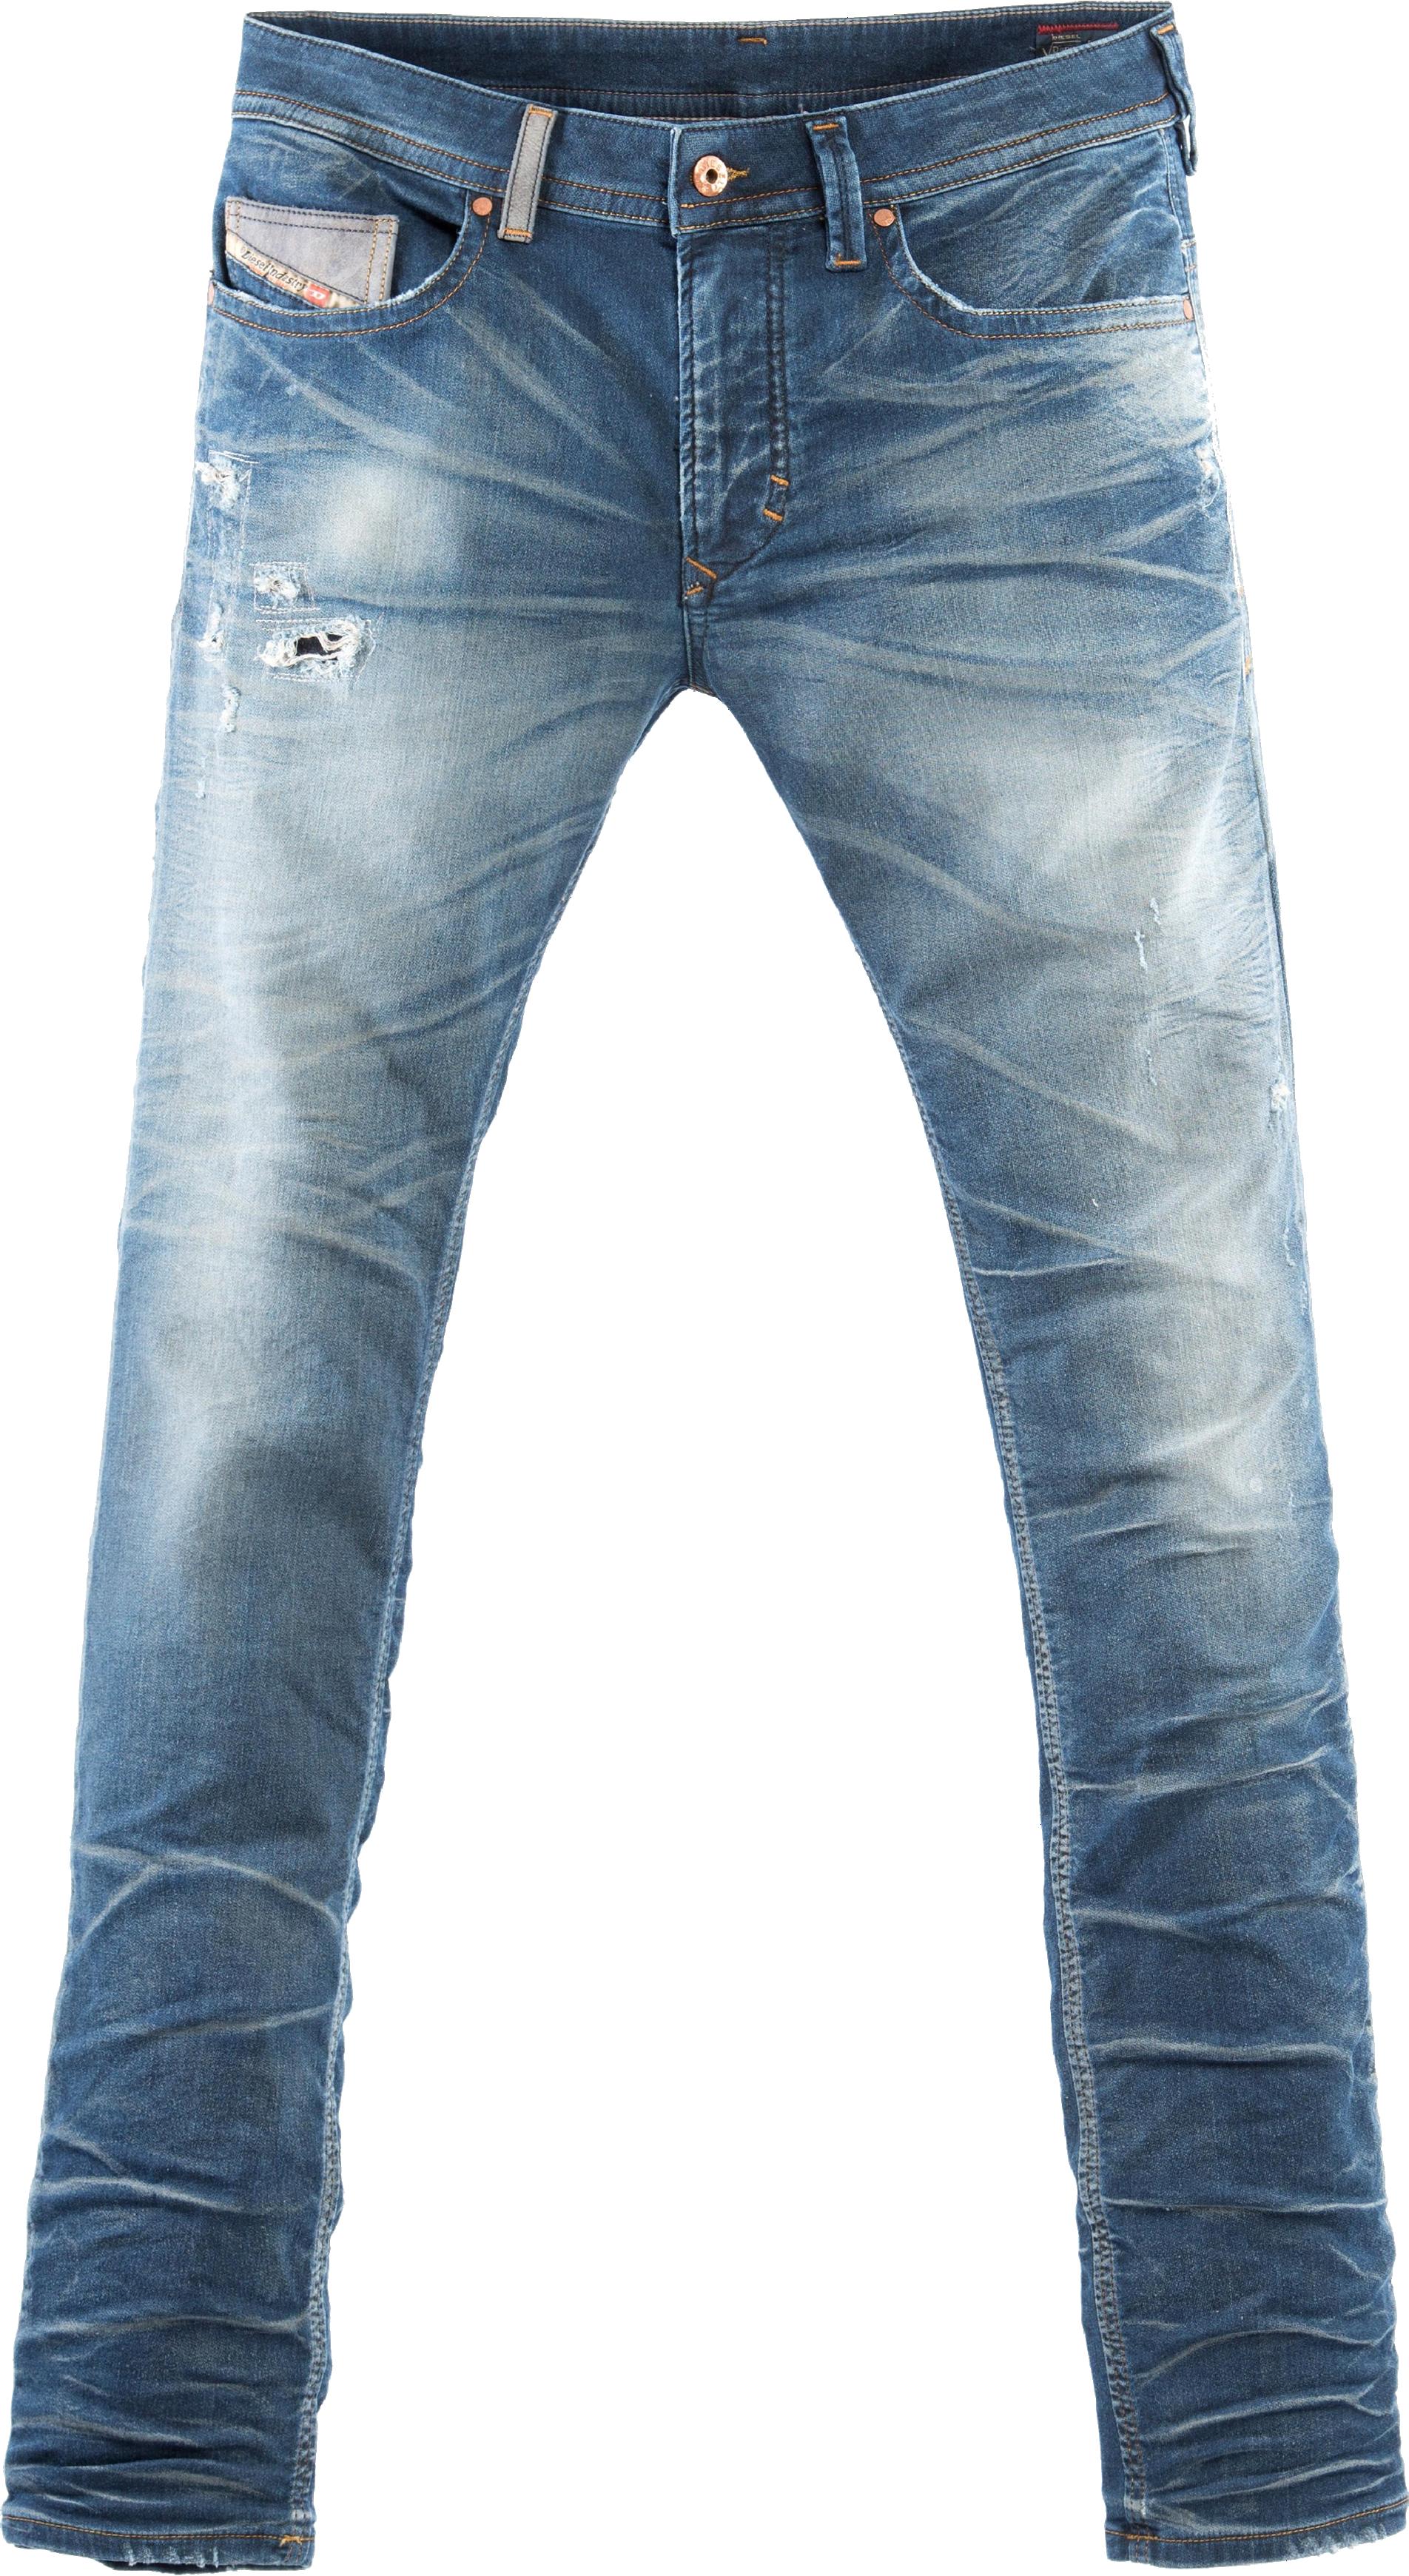 Jeans PNG Clipart, Blue Jean, Mens Jean, Denim Jeans HD.